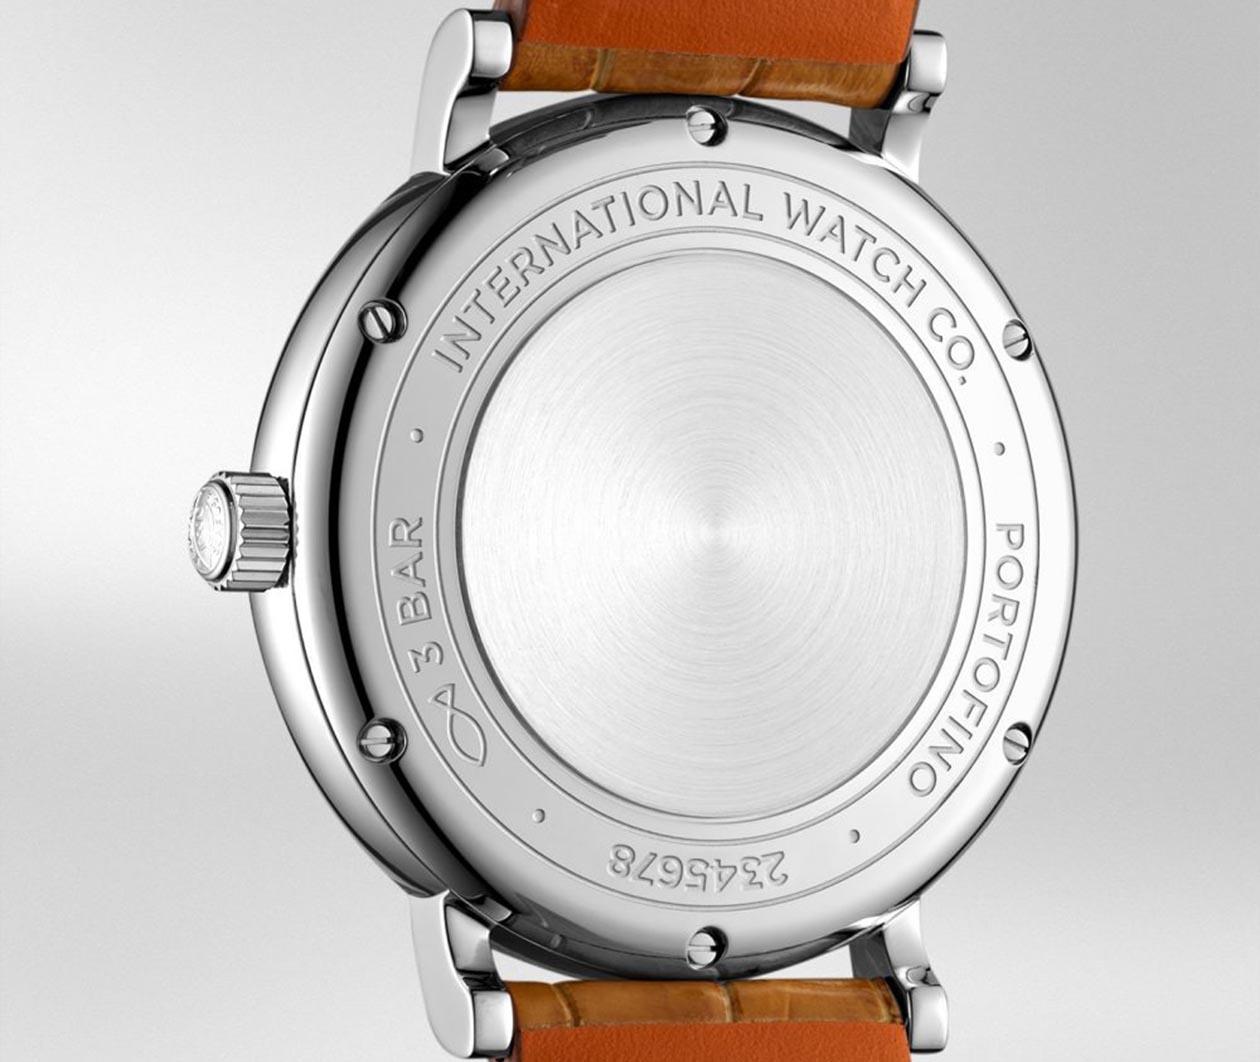 IWC Portofino Automatic37 IW458101 Carousel 5 FINAL